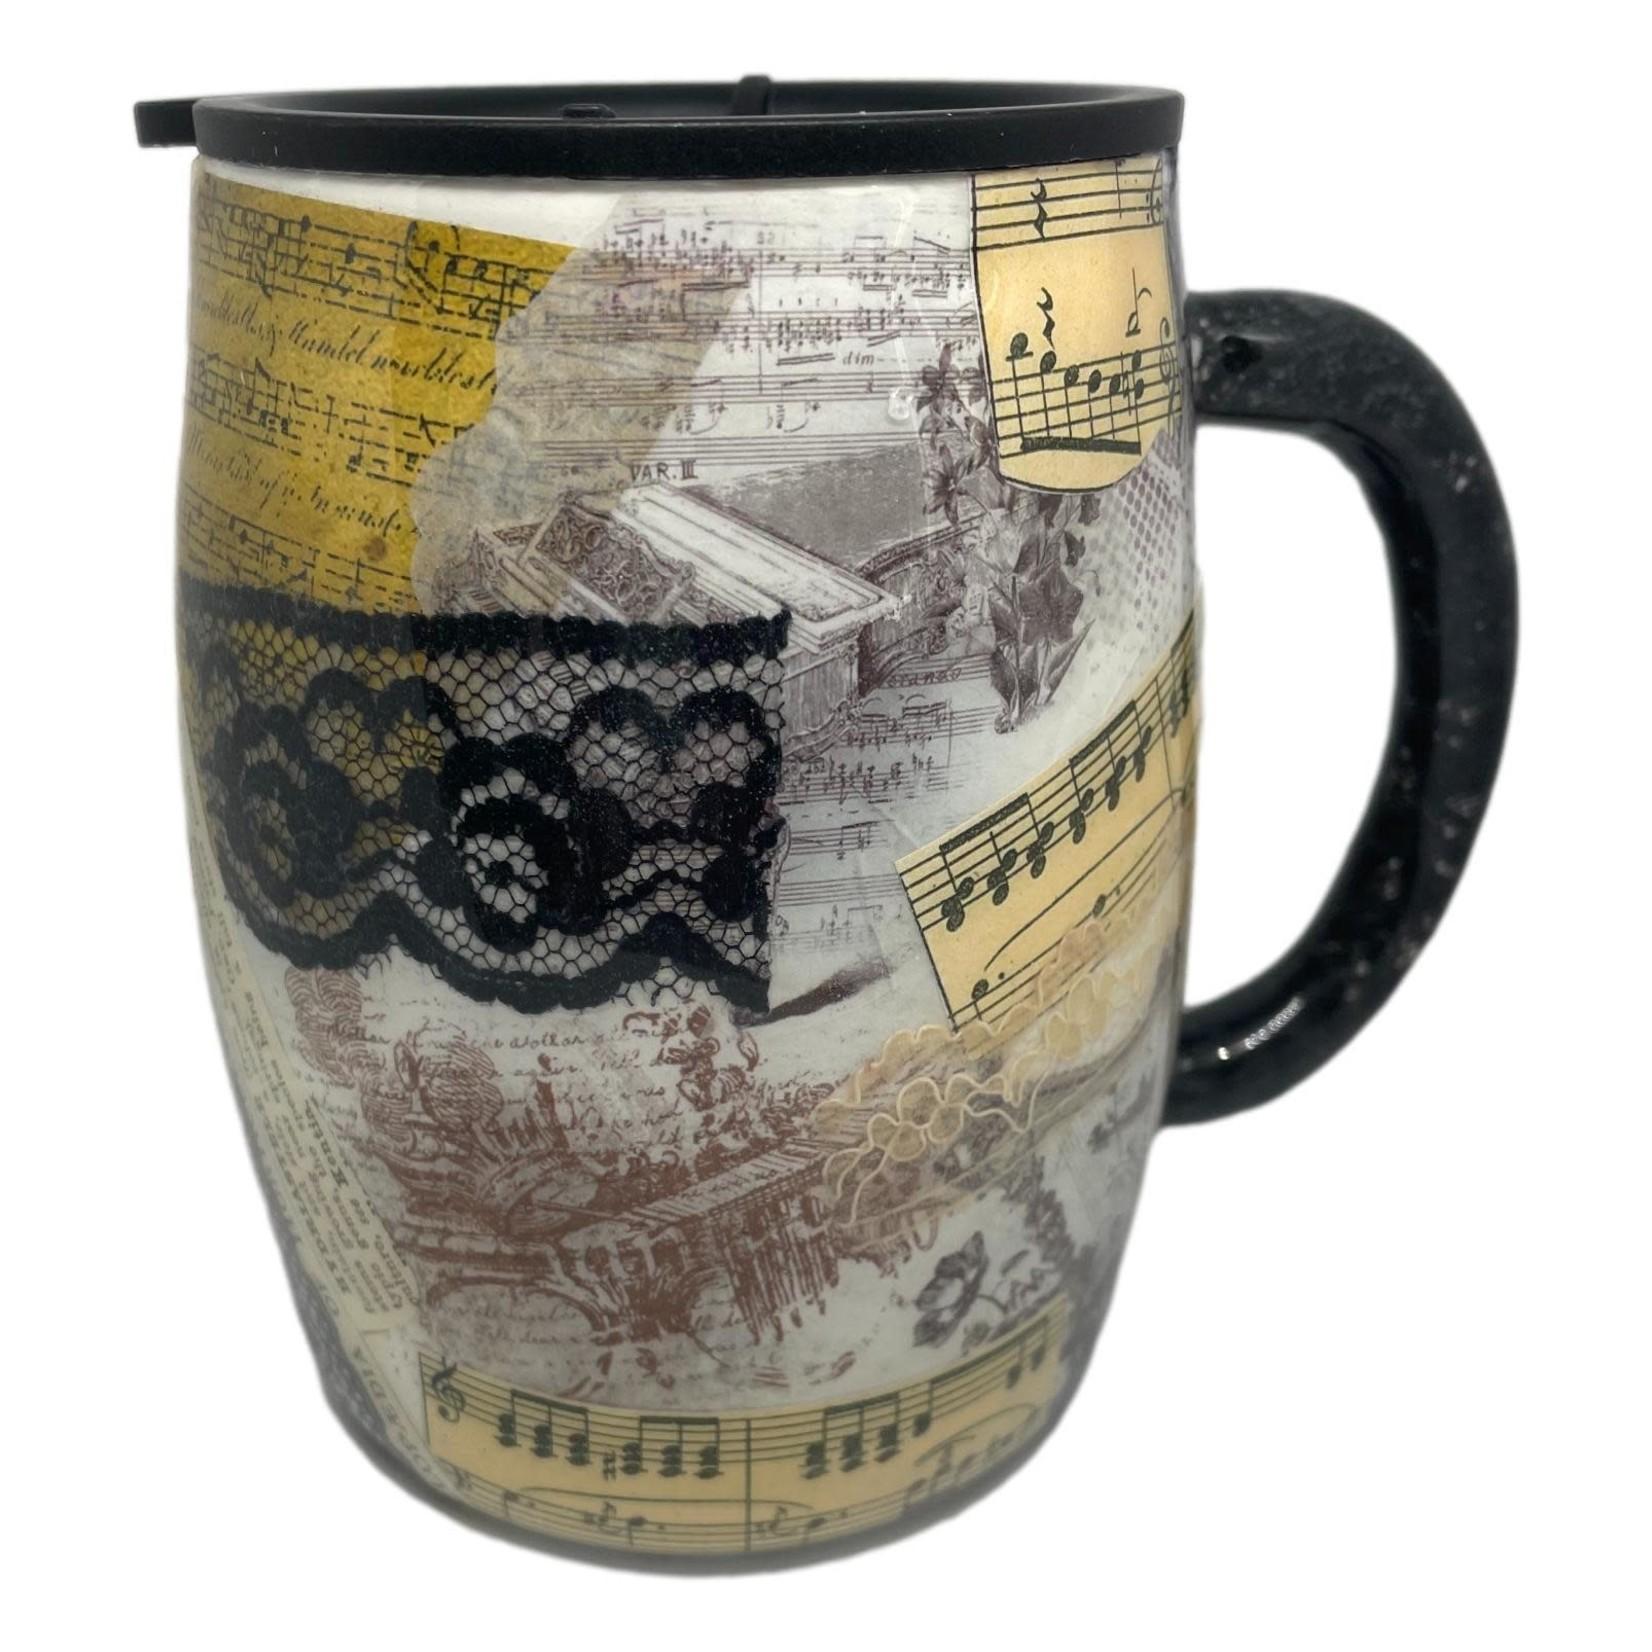 East Coast Sirens Vintage Collage Coffee Tumbler w/Handle 14oz